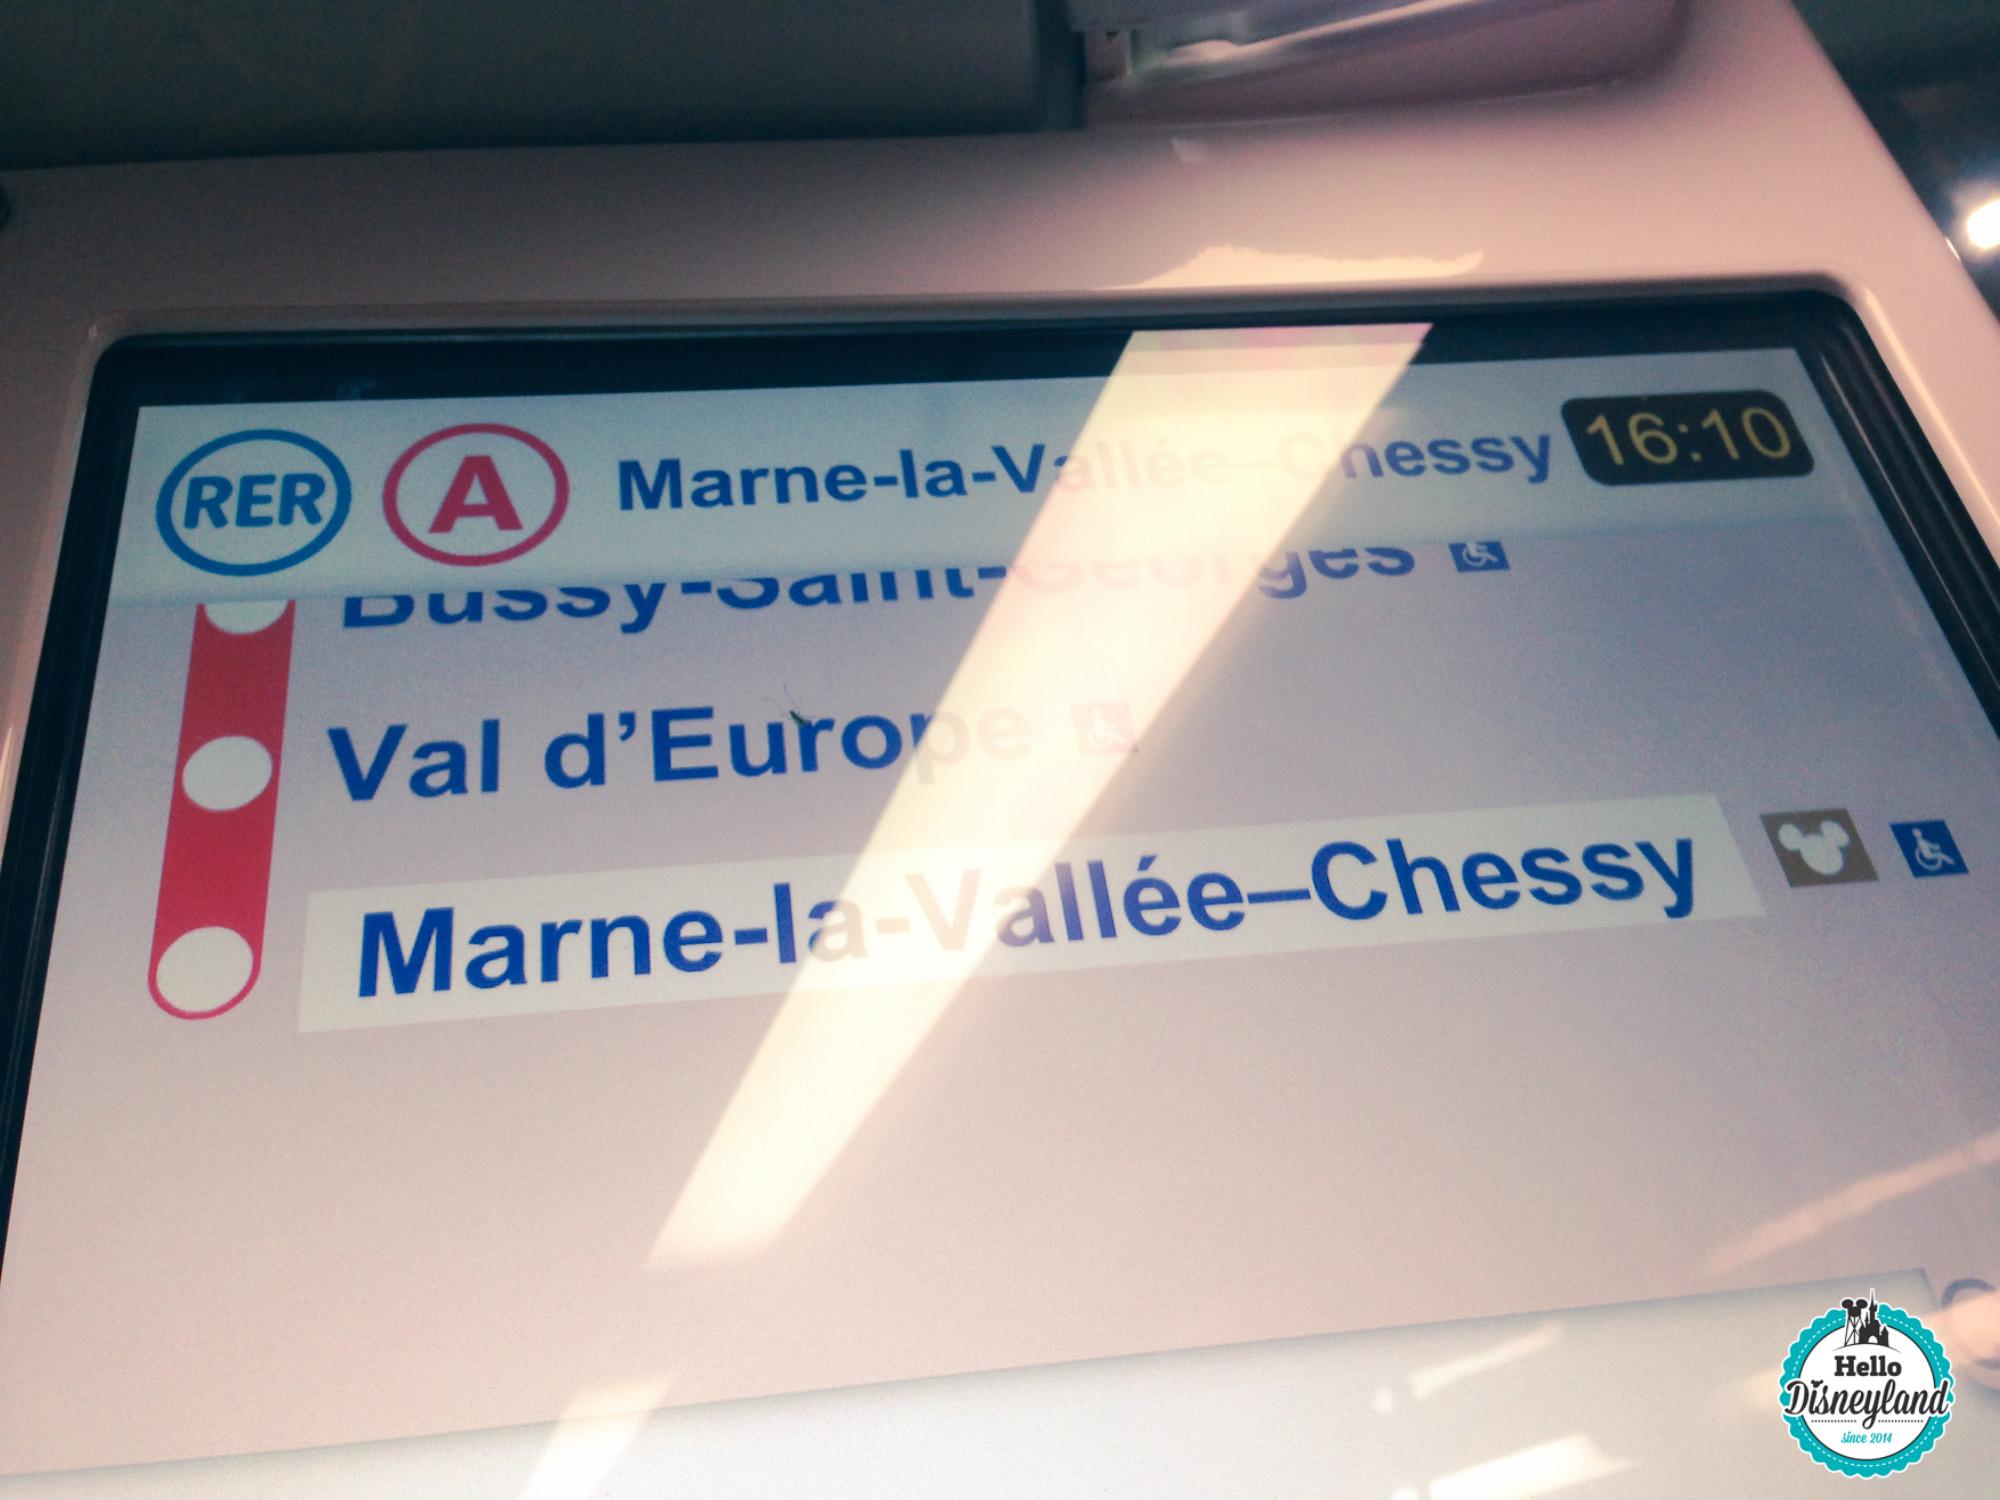 Hello disneyland le blog n 1 sur disneyland paris - Marne la vallee magasin ...